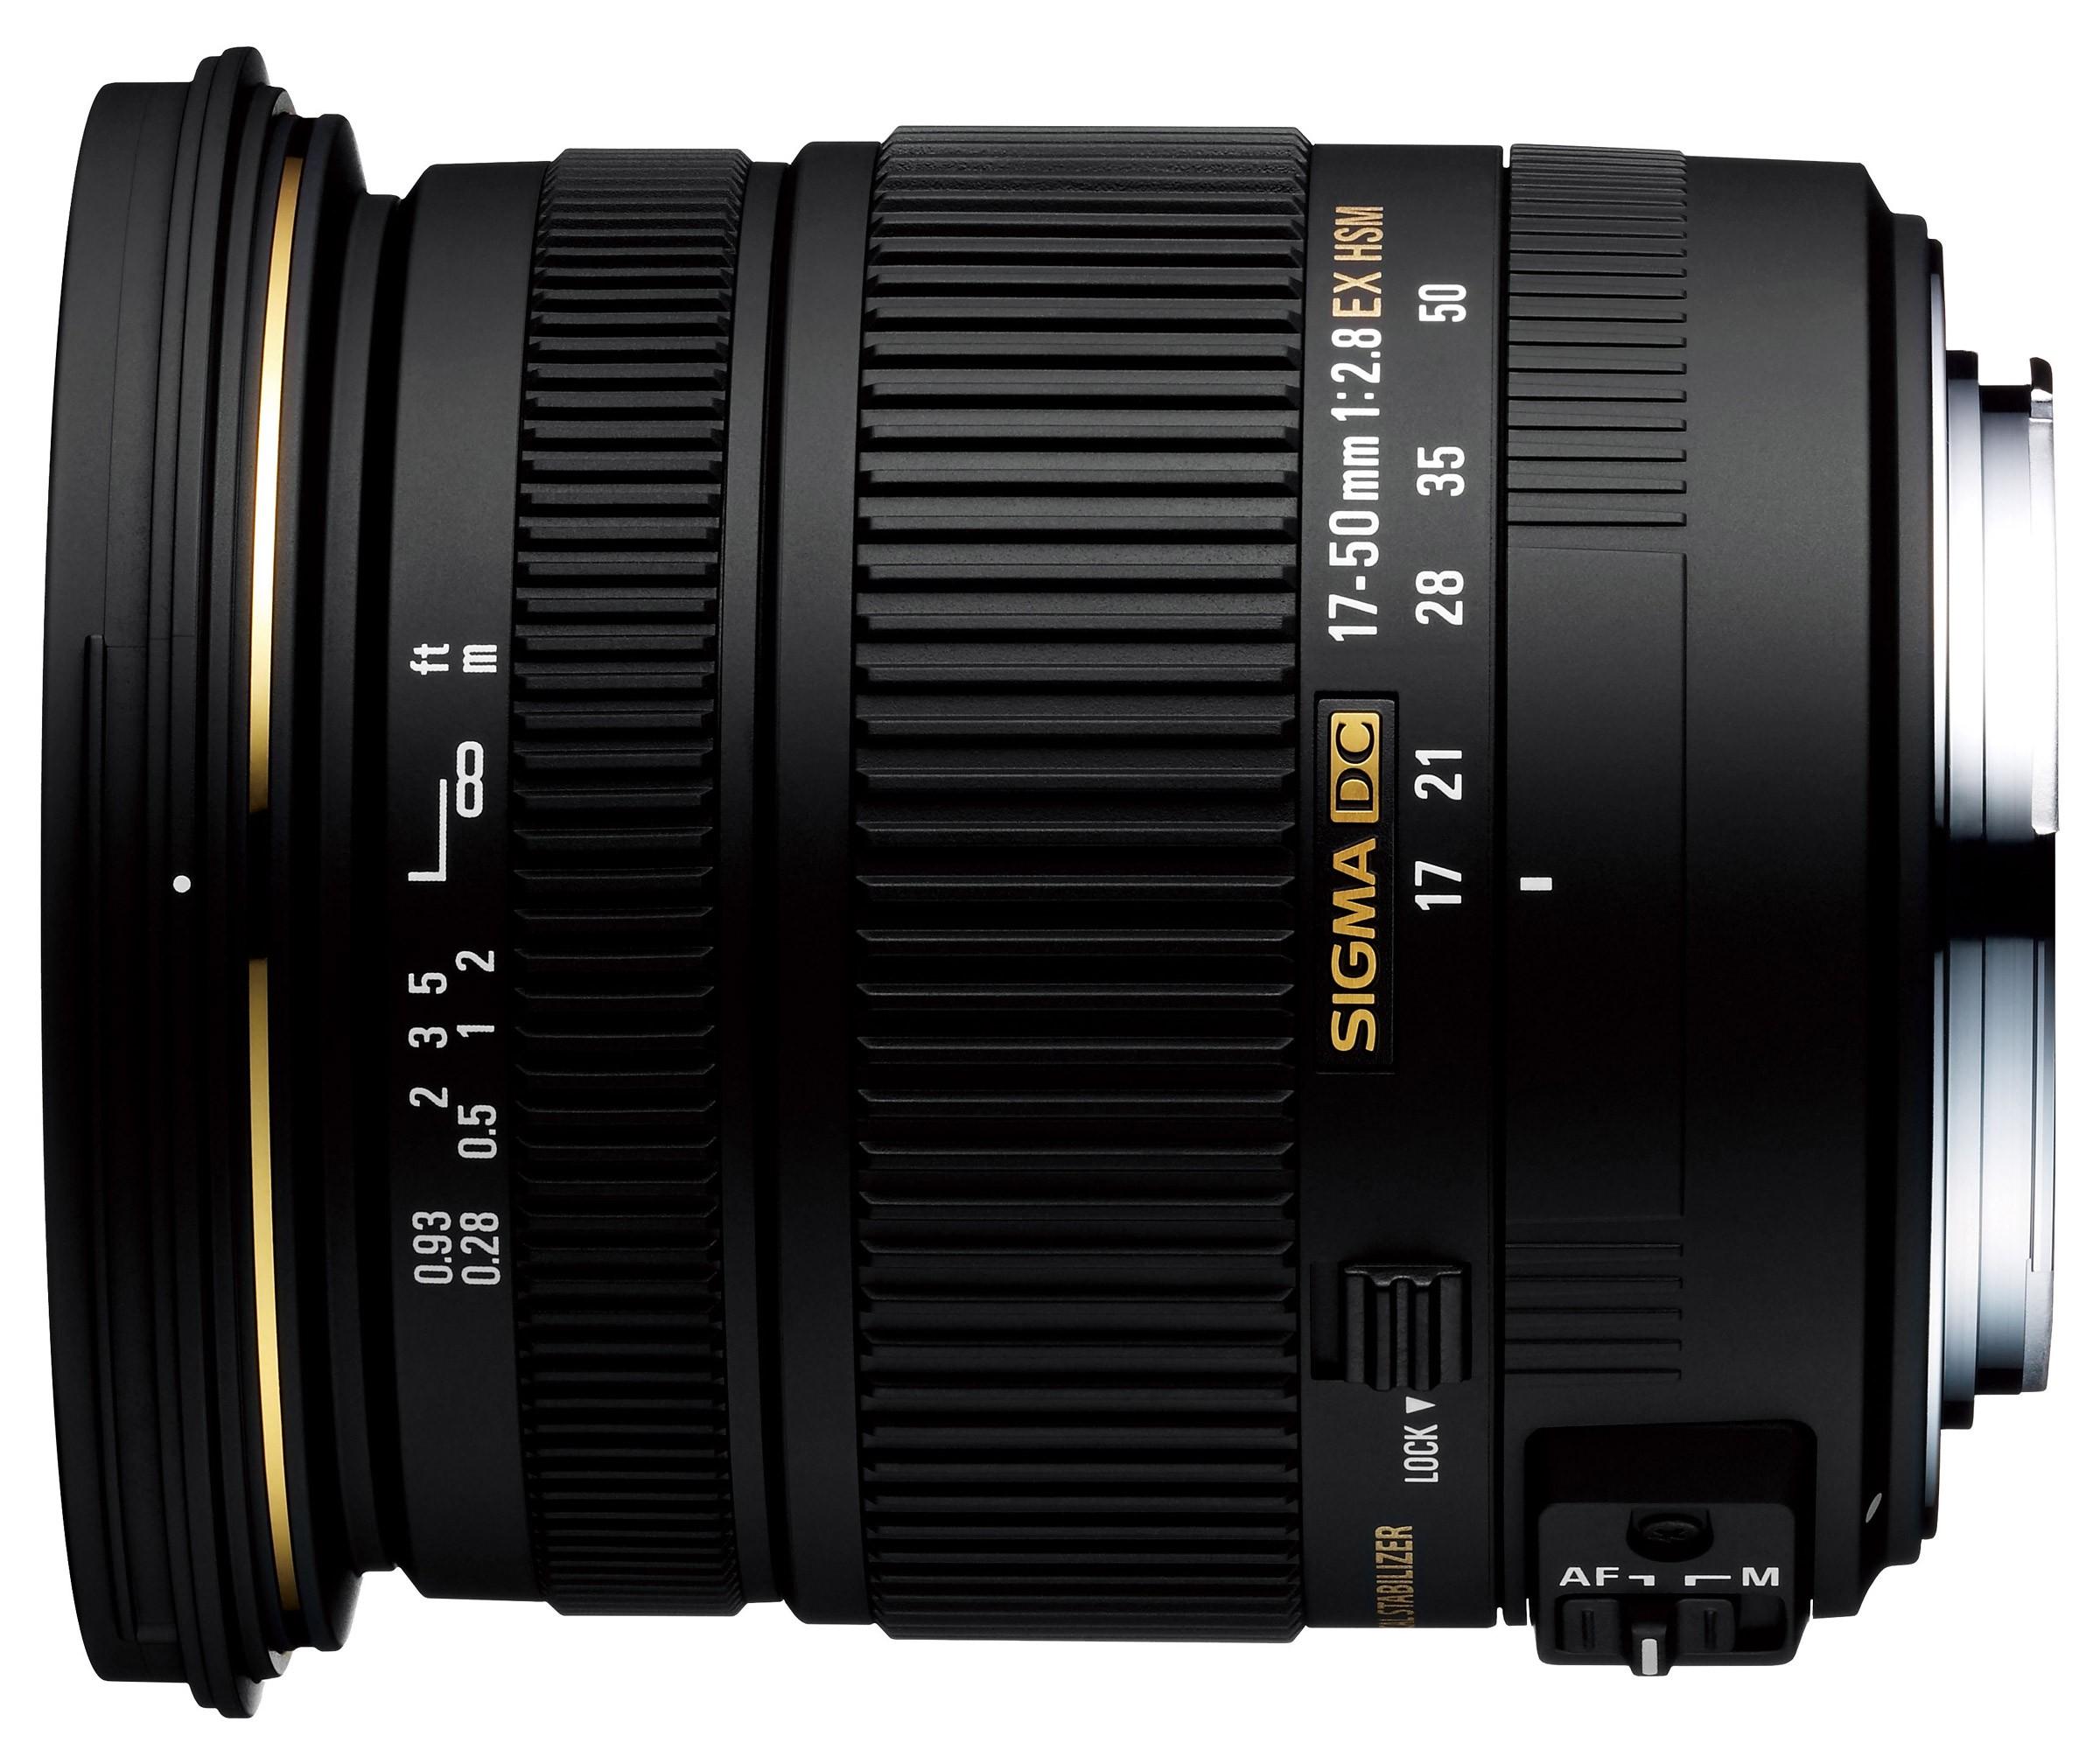 Obiettivo Sigma 17-50mm f/2.8 EX DC OS HSM (Nikon)